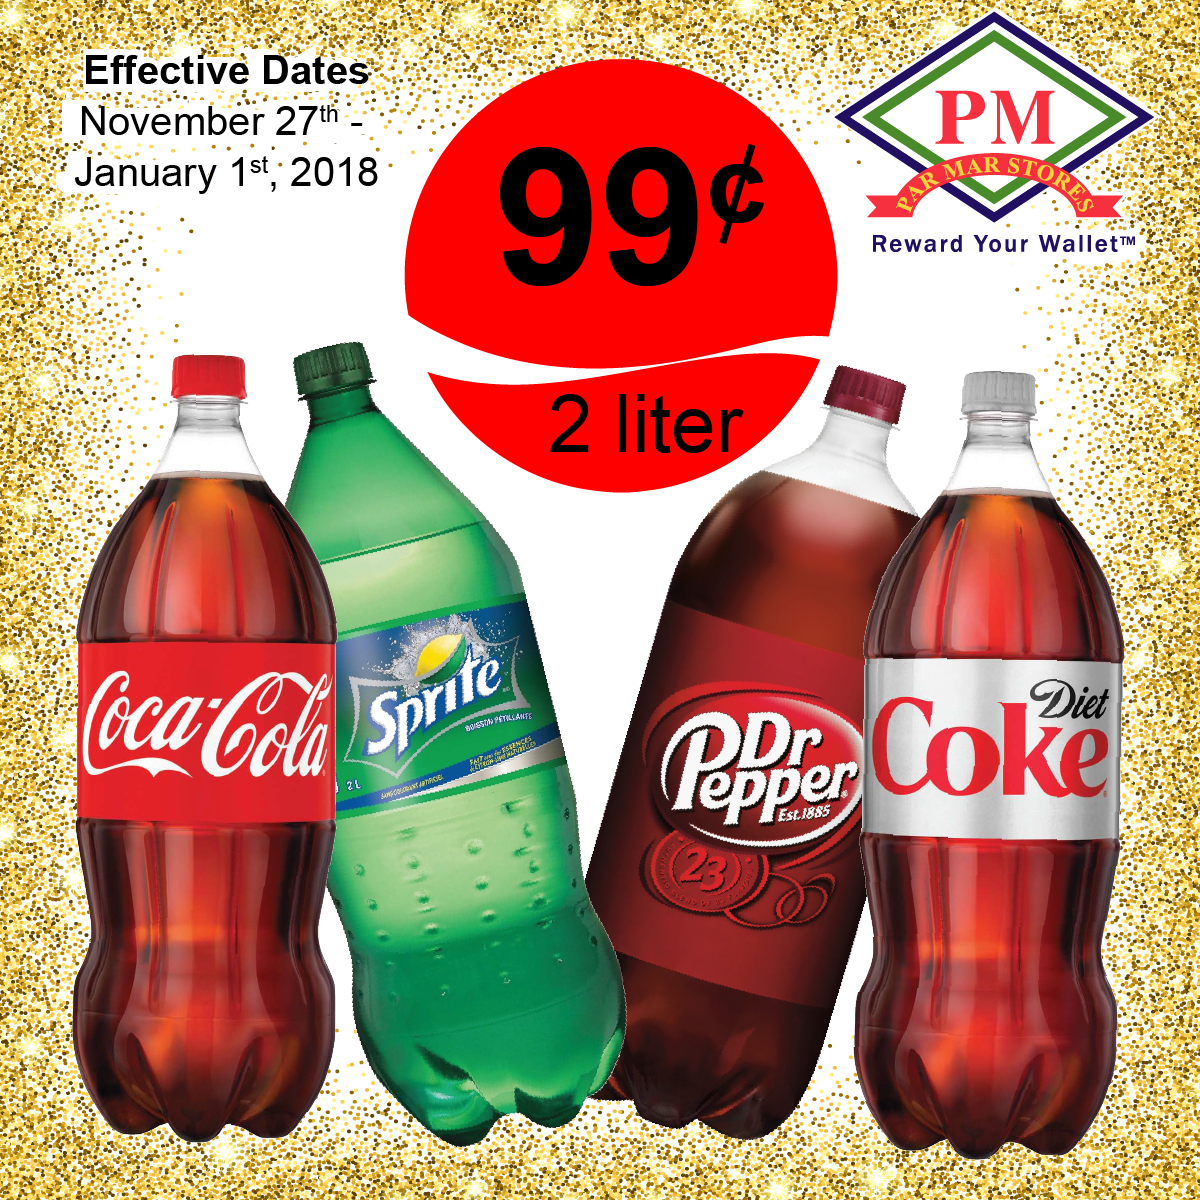 Coca Cola 2 Liter